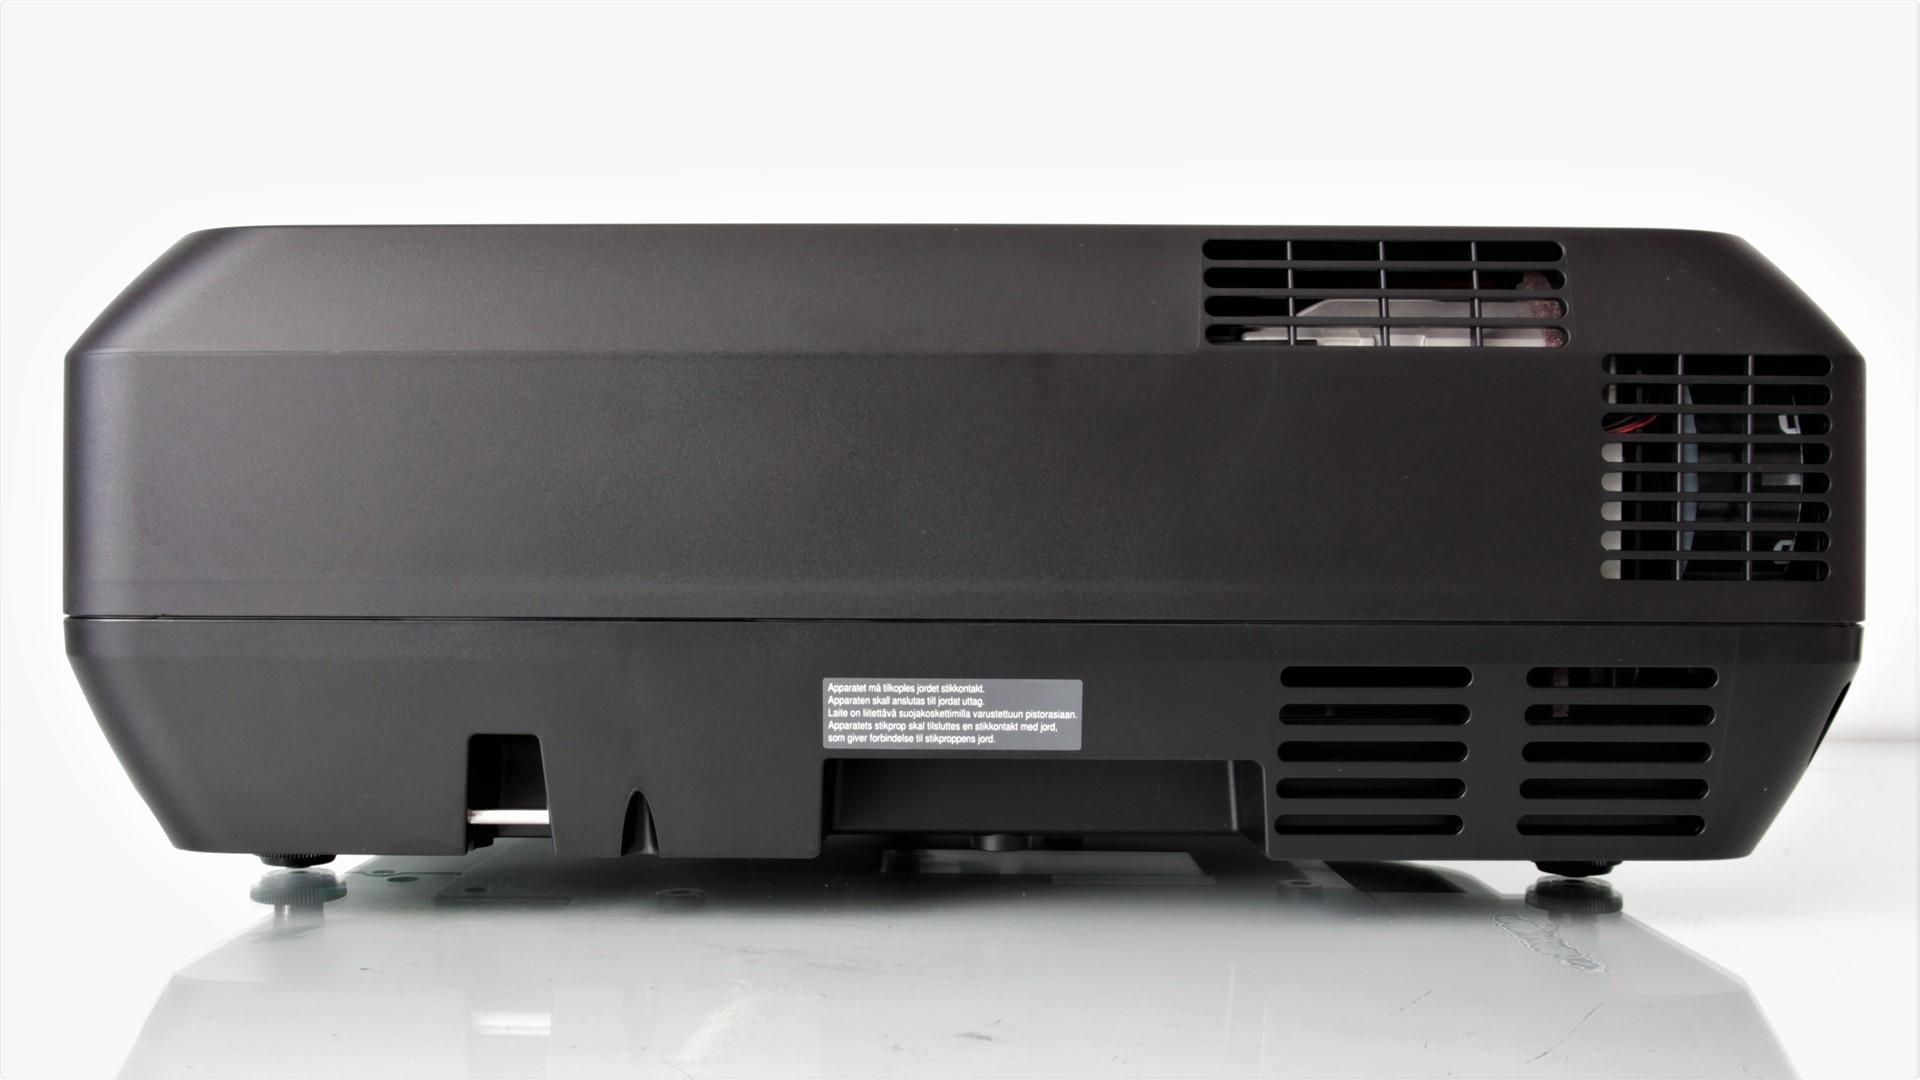 Proiector Laser Epson Eh Ls100 Review Gadget Ro Hi